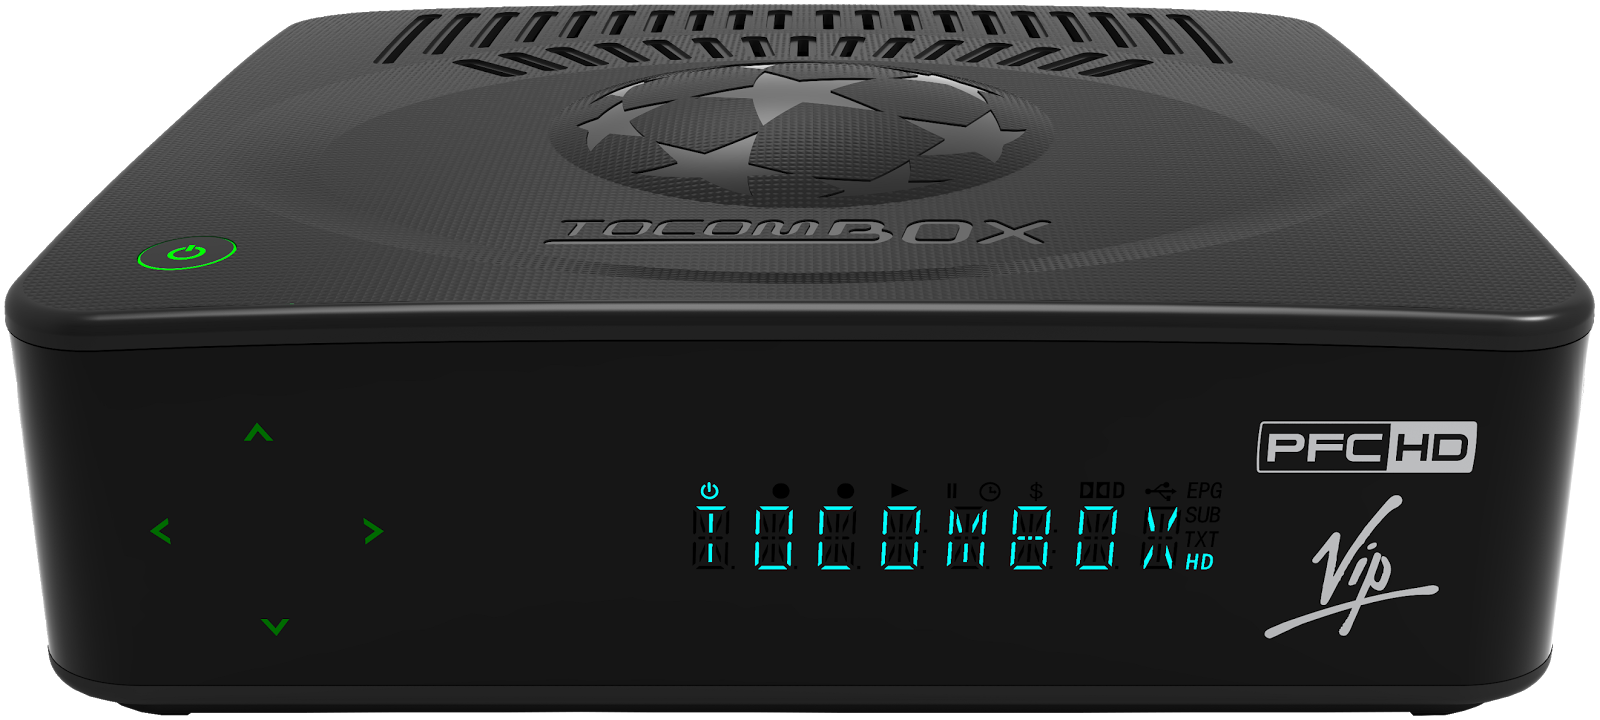 Colocar CS tocombox%2Bpfc%2Bvip Atualização Tocombox PFC VIP e ZEUS VIP 2015 comprar cs